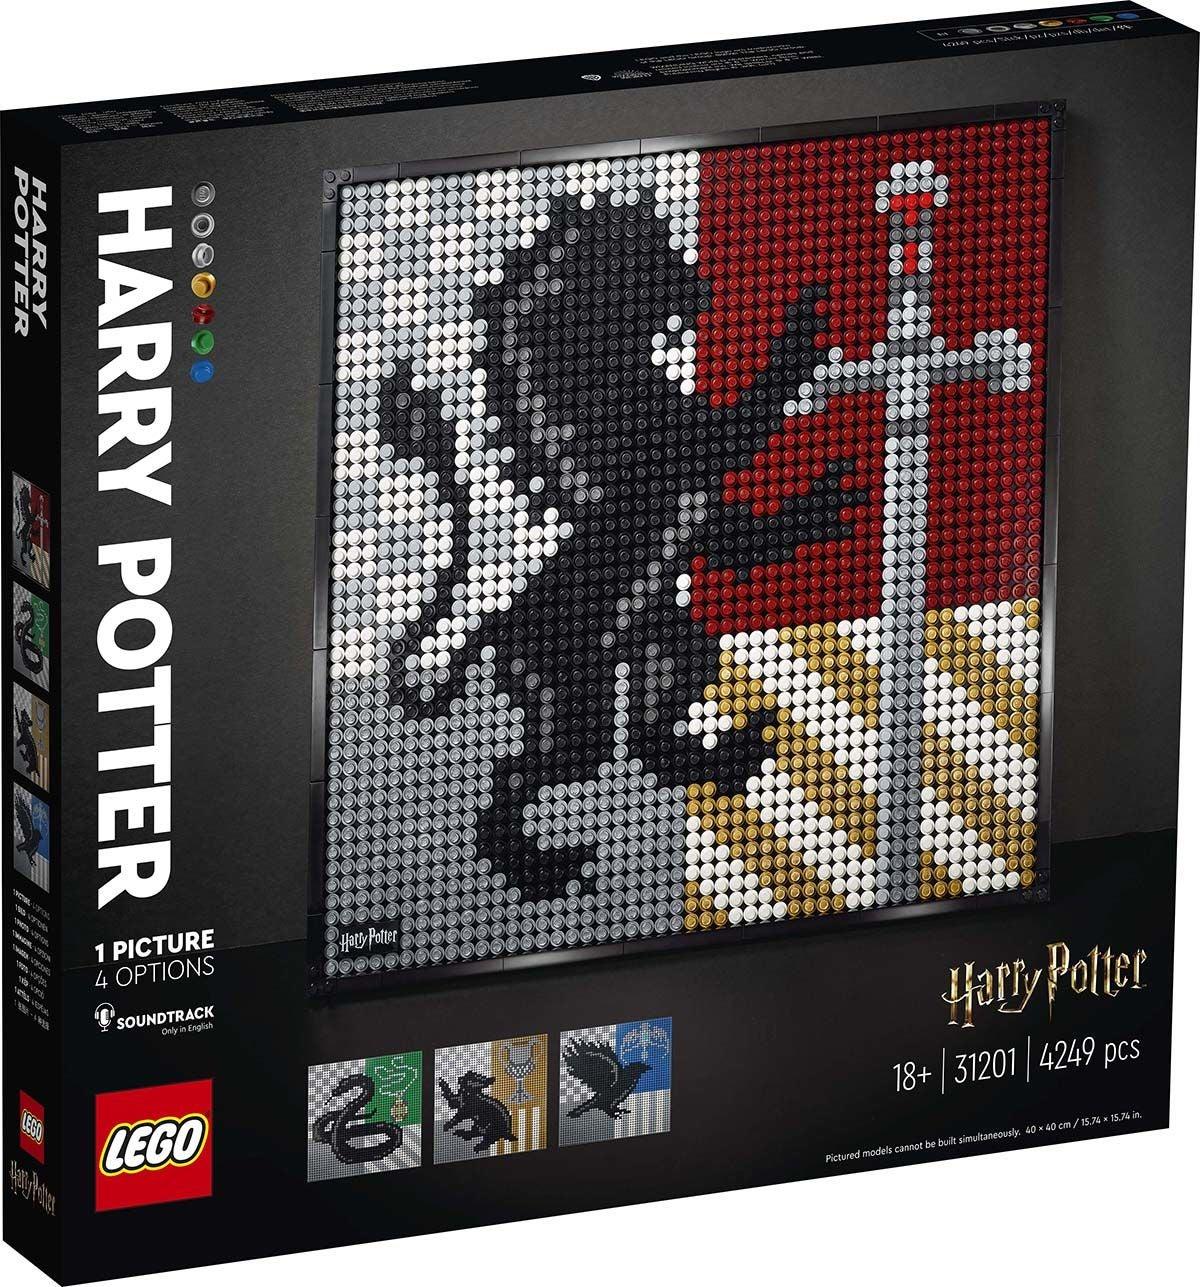 LEGO ART 31201 Harry Potter™ Tylypahkan Vaakunat